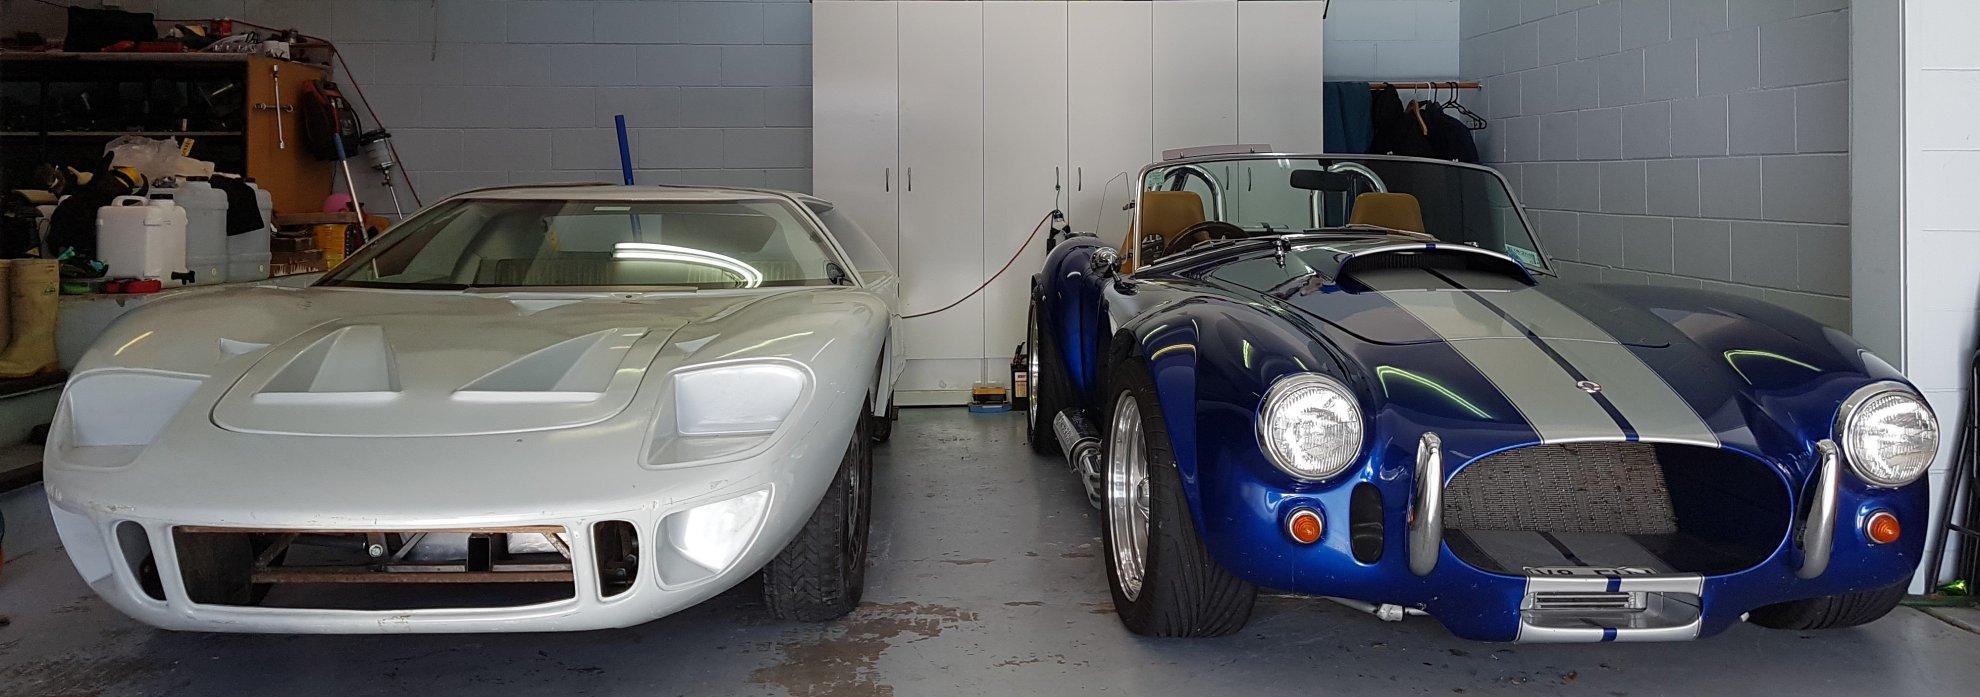 Macs GT40 Cobra.jpg